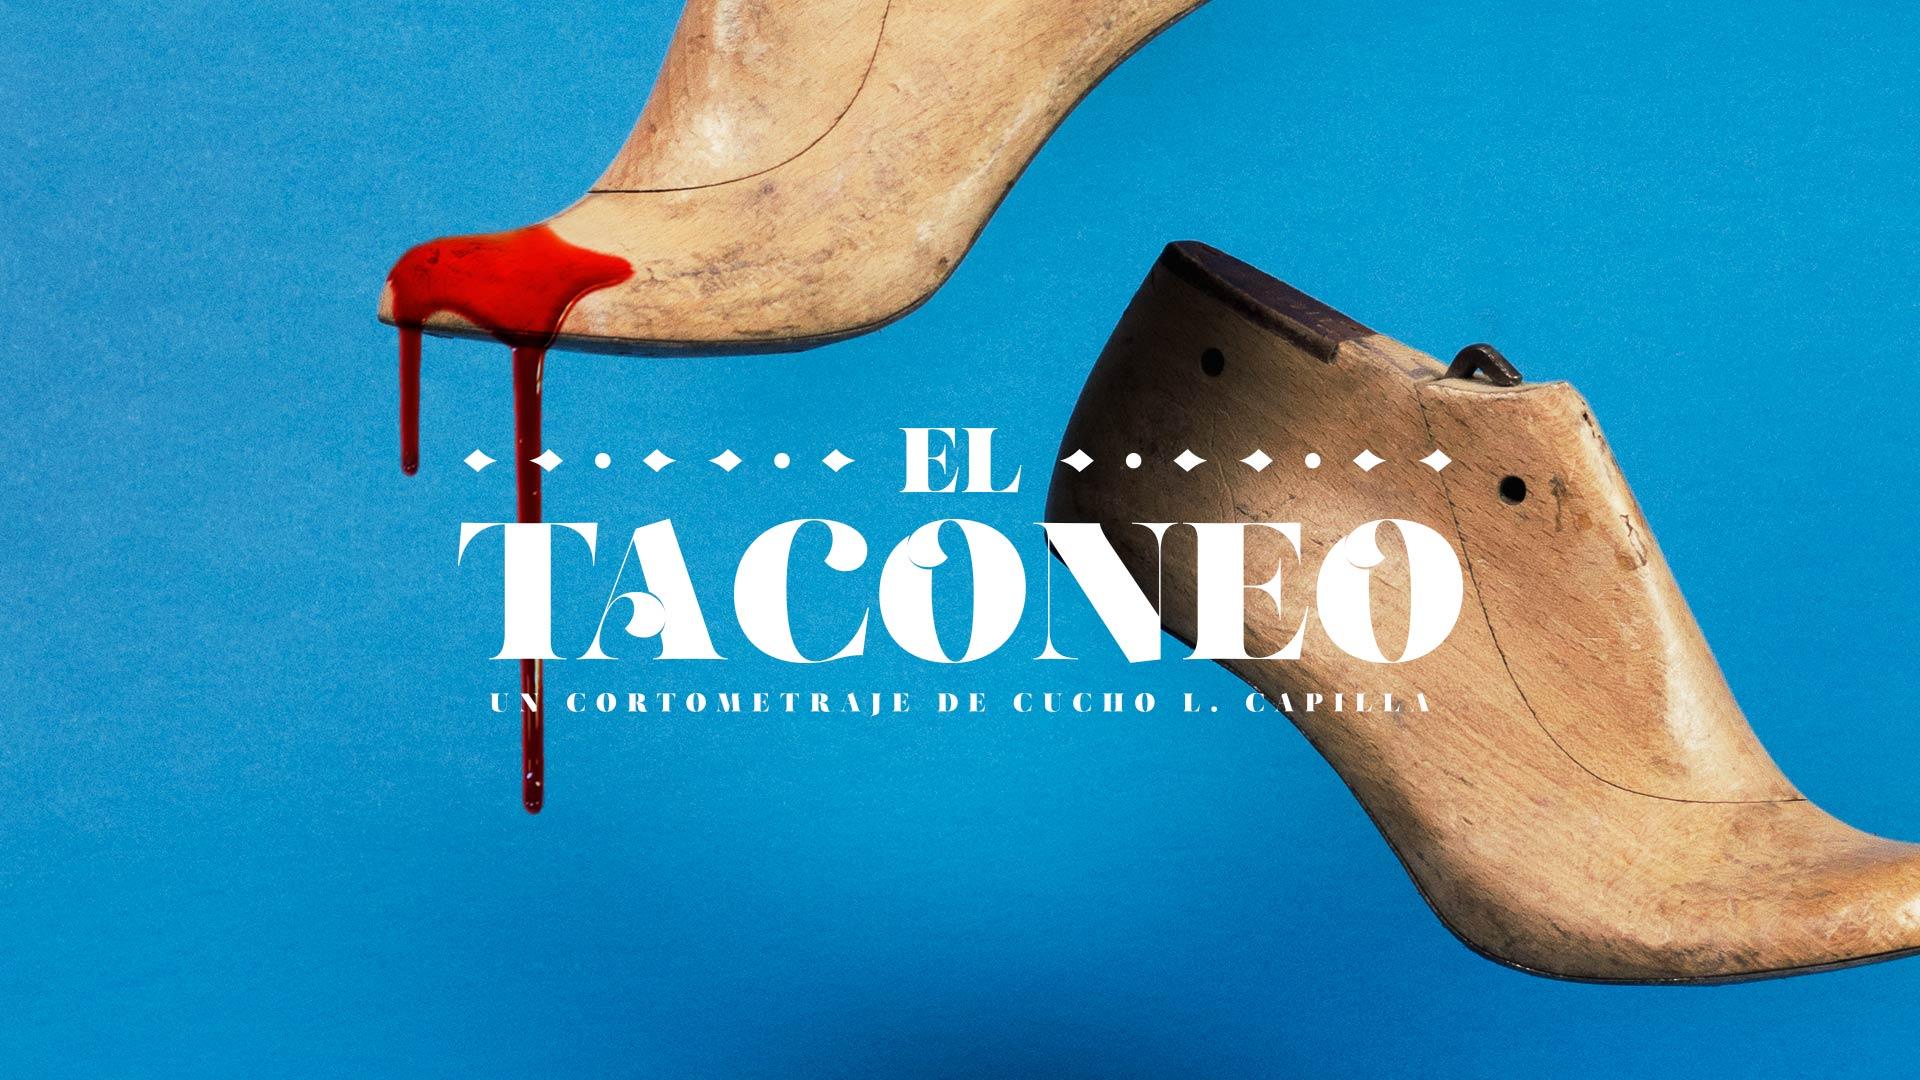 Cartel El taconeo El Taconeo img-total